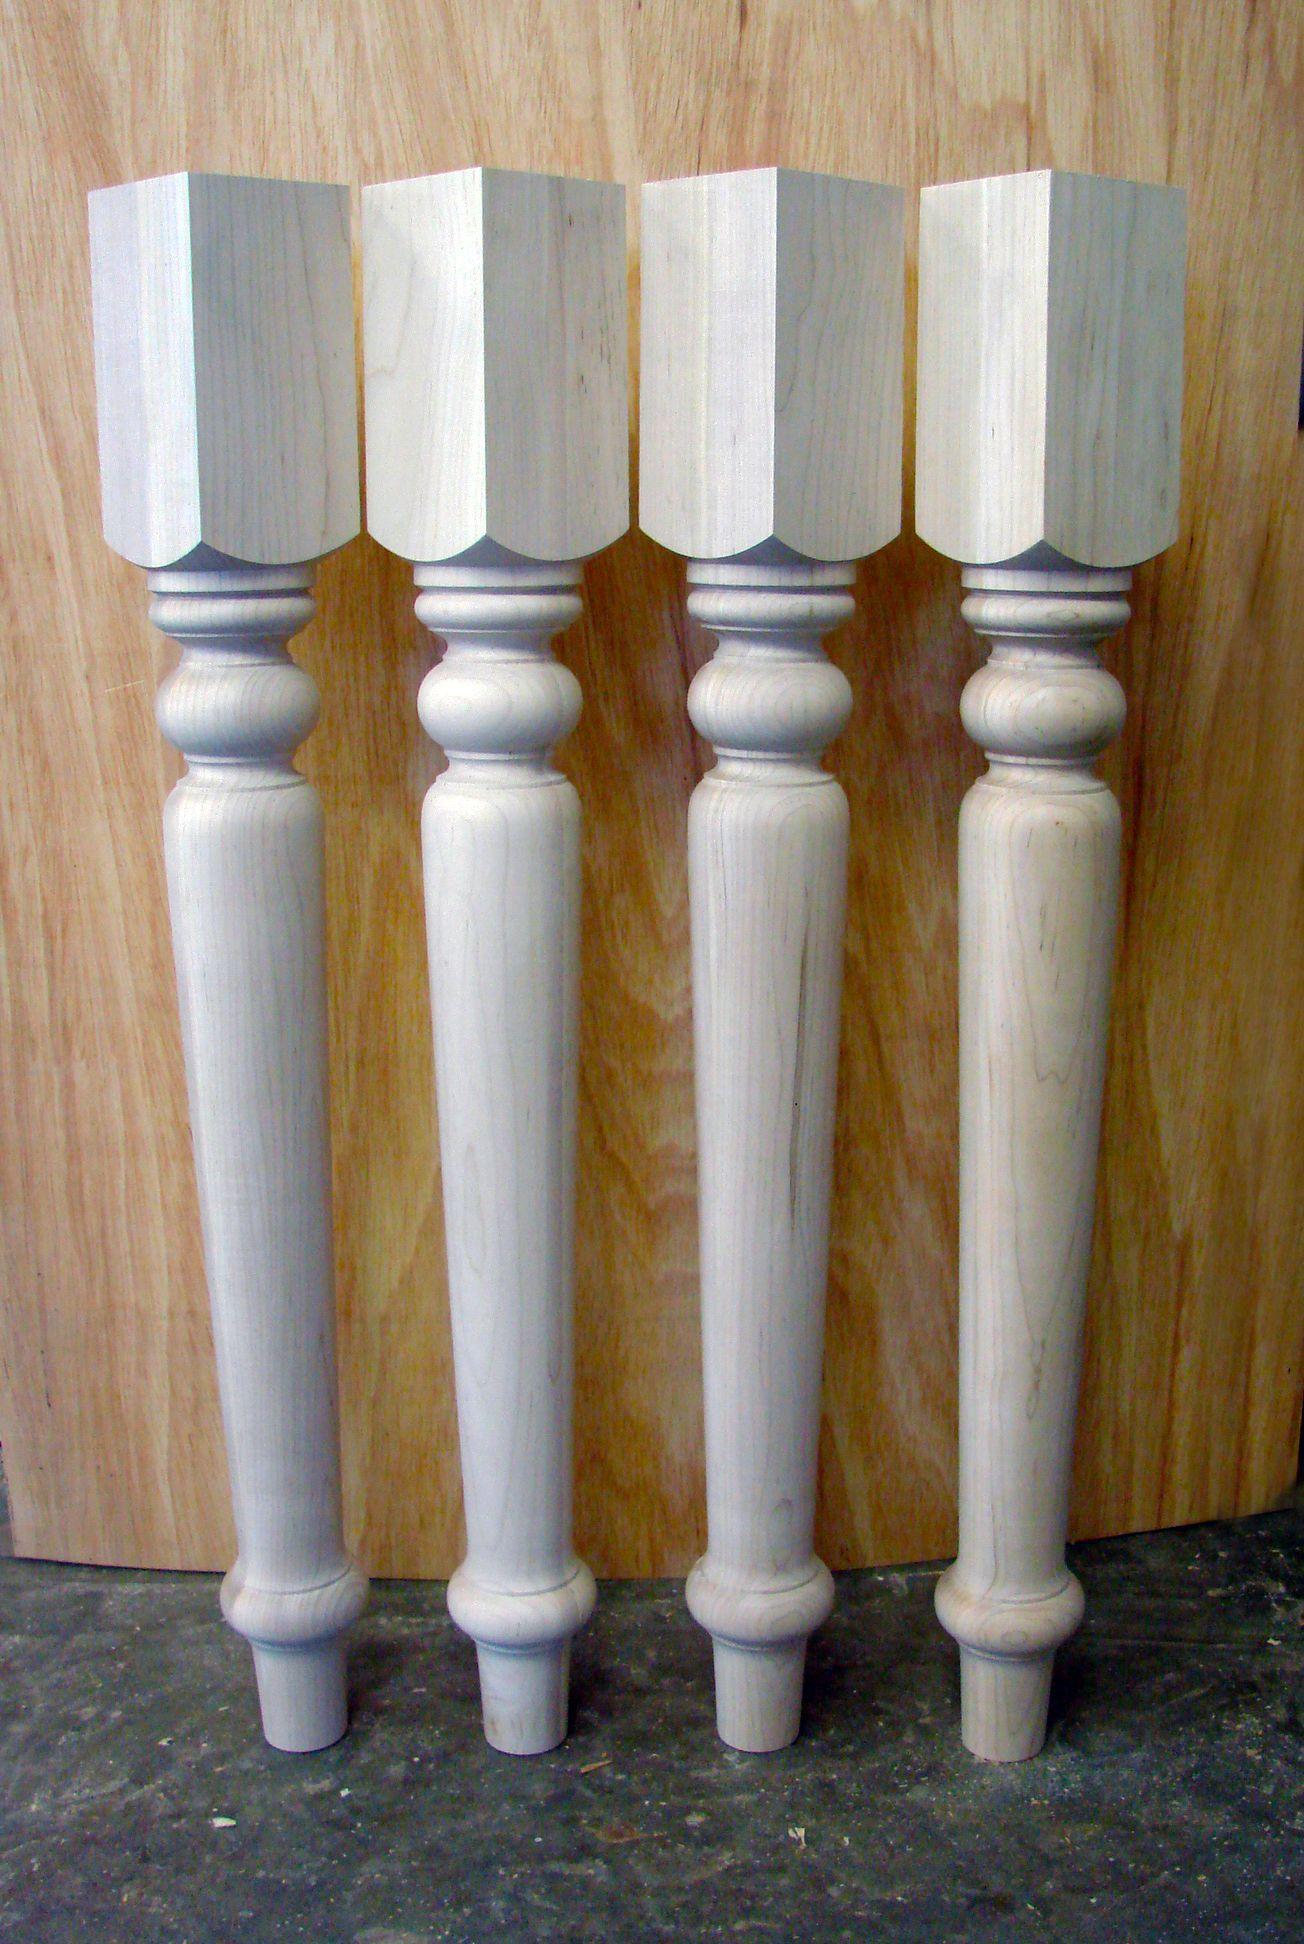 Colorado Pattern Table Legs 4 Quot X 36 Quot Maple Table